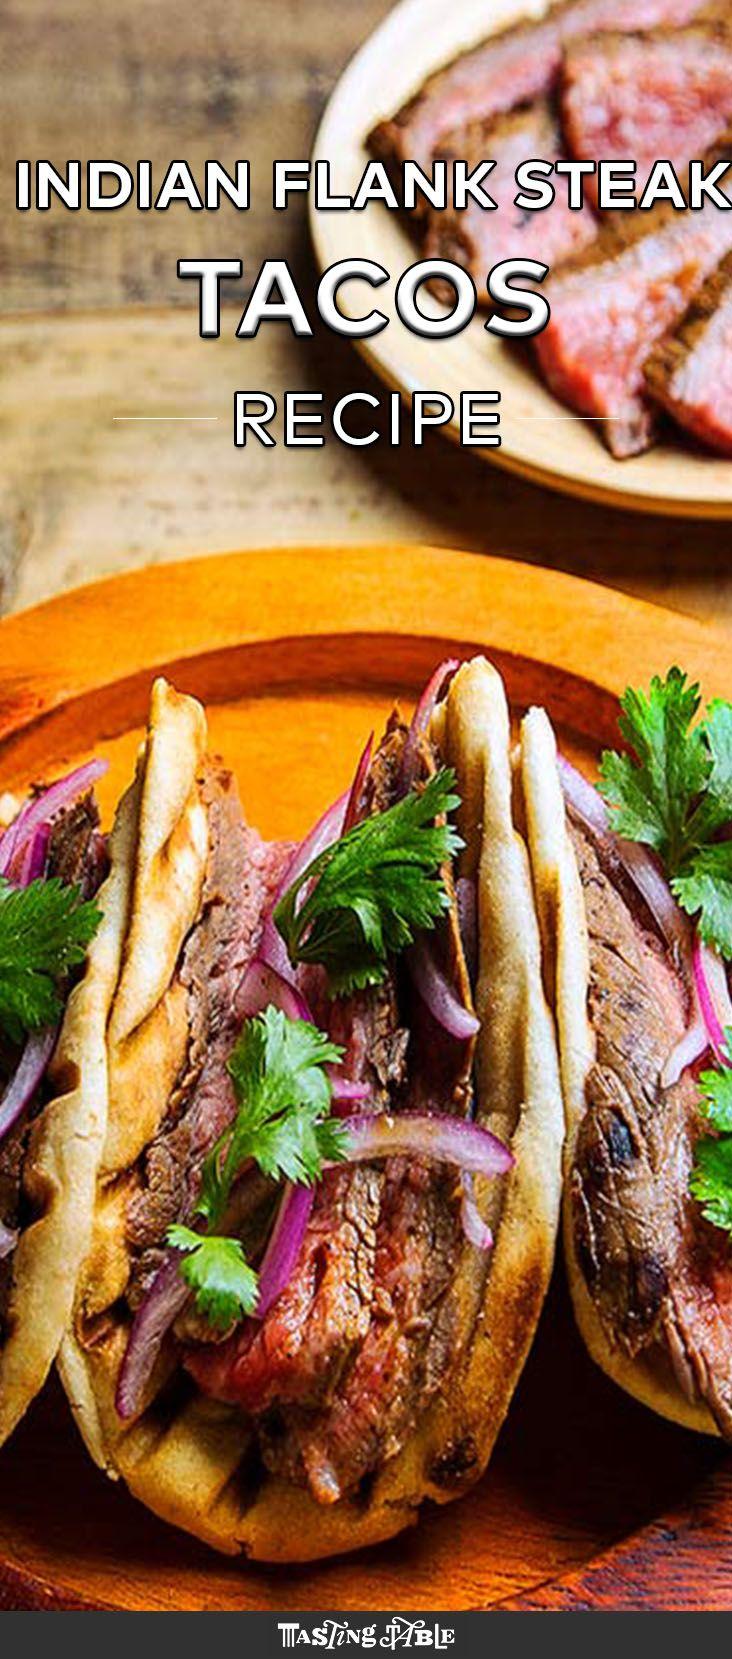 245 best best picnic recipes images on pinterest picnic recipes indian flank steak tacos forumfinder Images